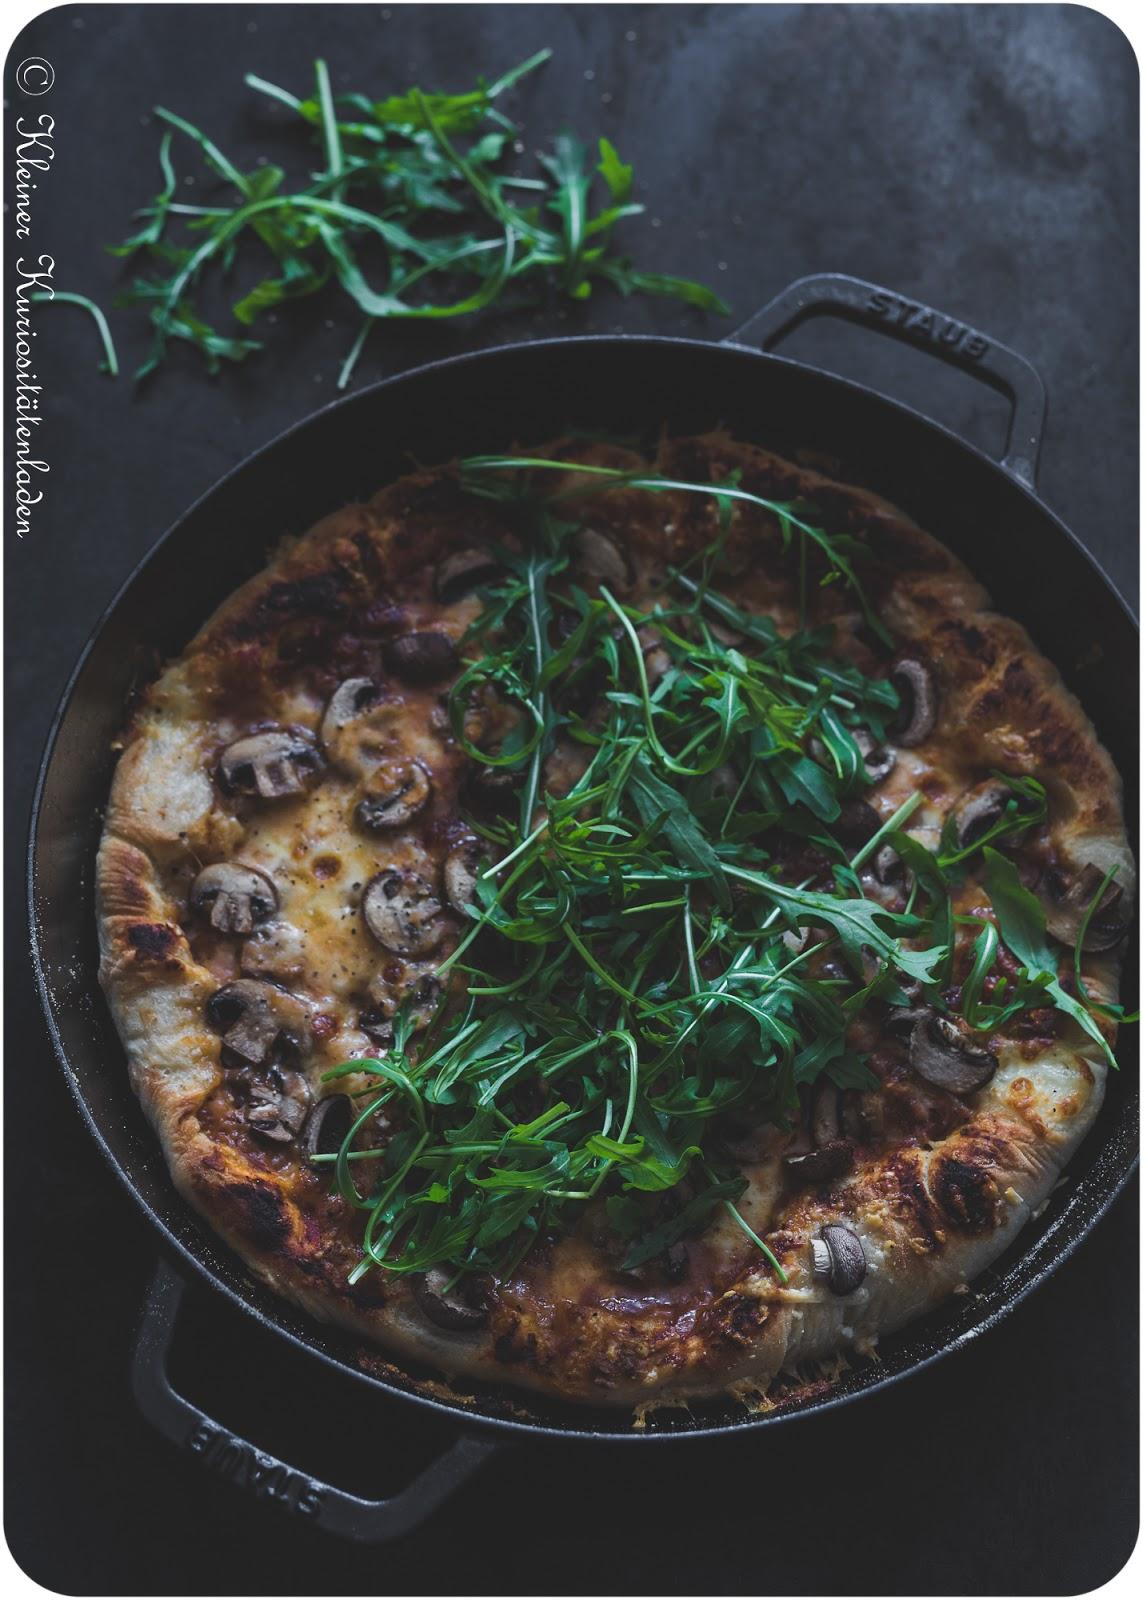 Pizza Funghi mit Knoblauch-Chili-Honig und Rucola